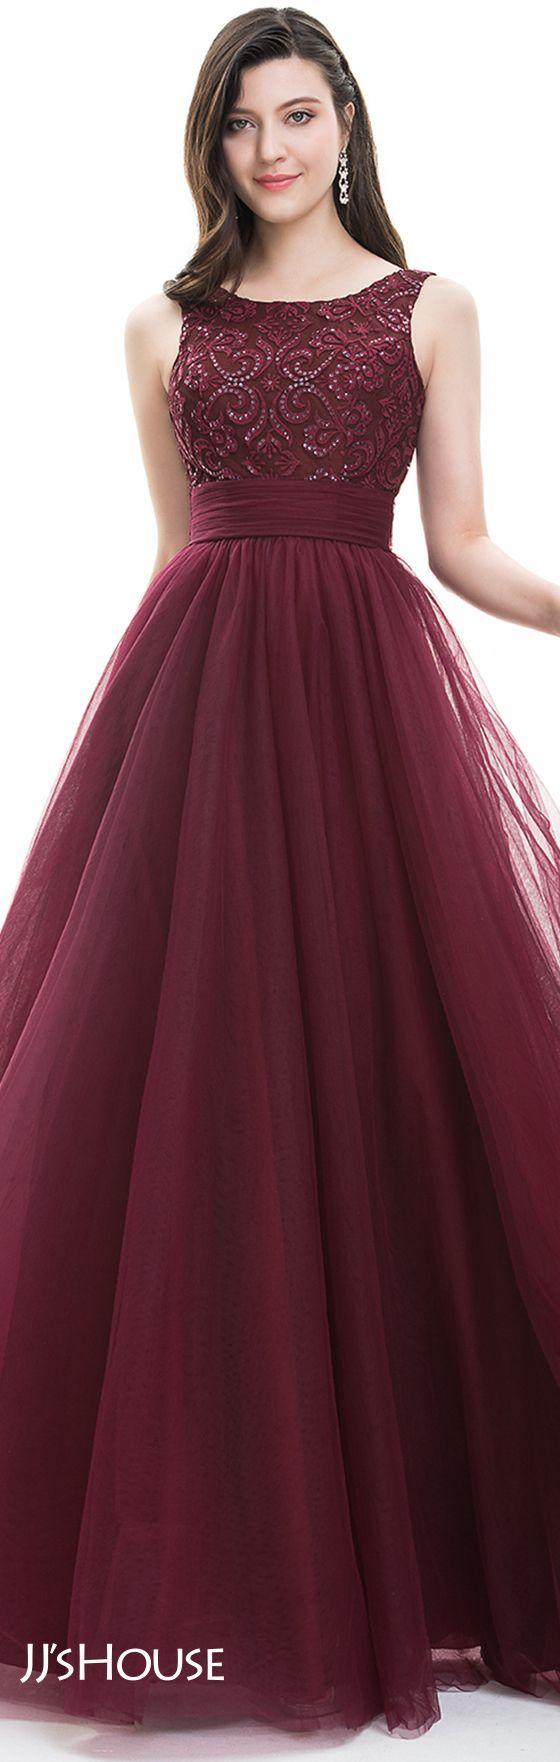 JJsHouse #Prom #women#kleid#dress  Dresses, Prom dresses long